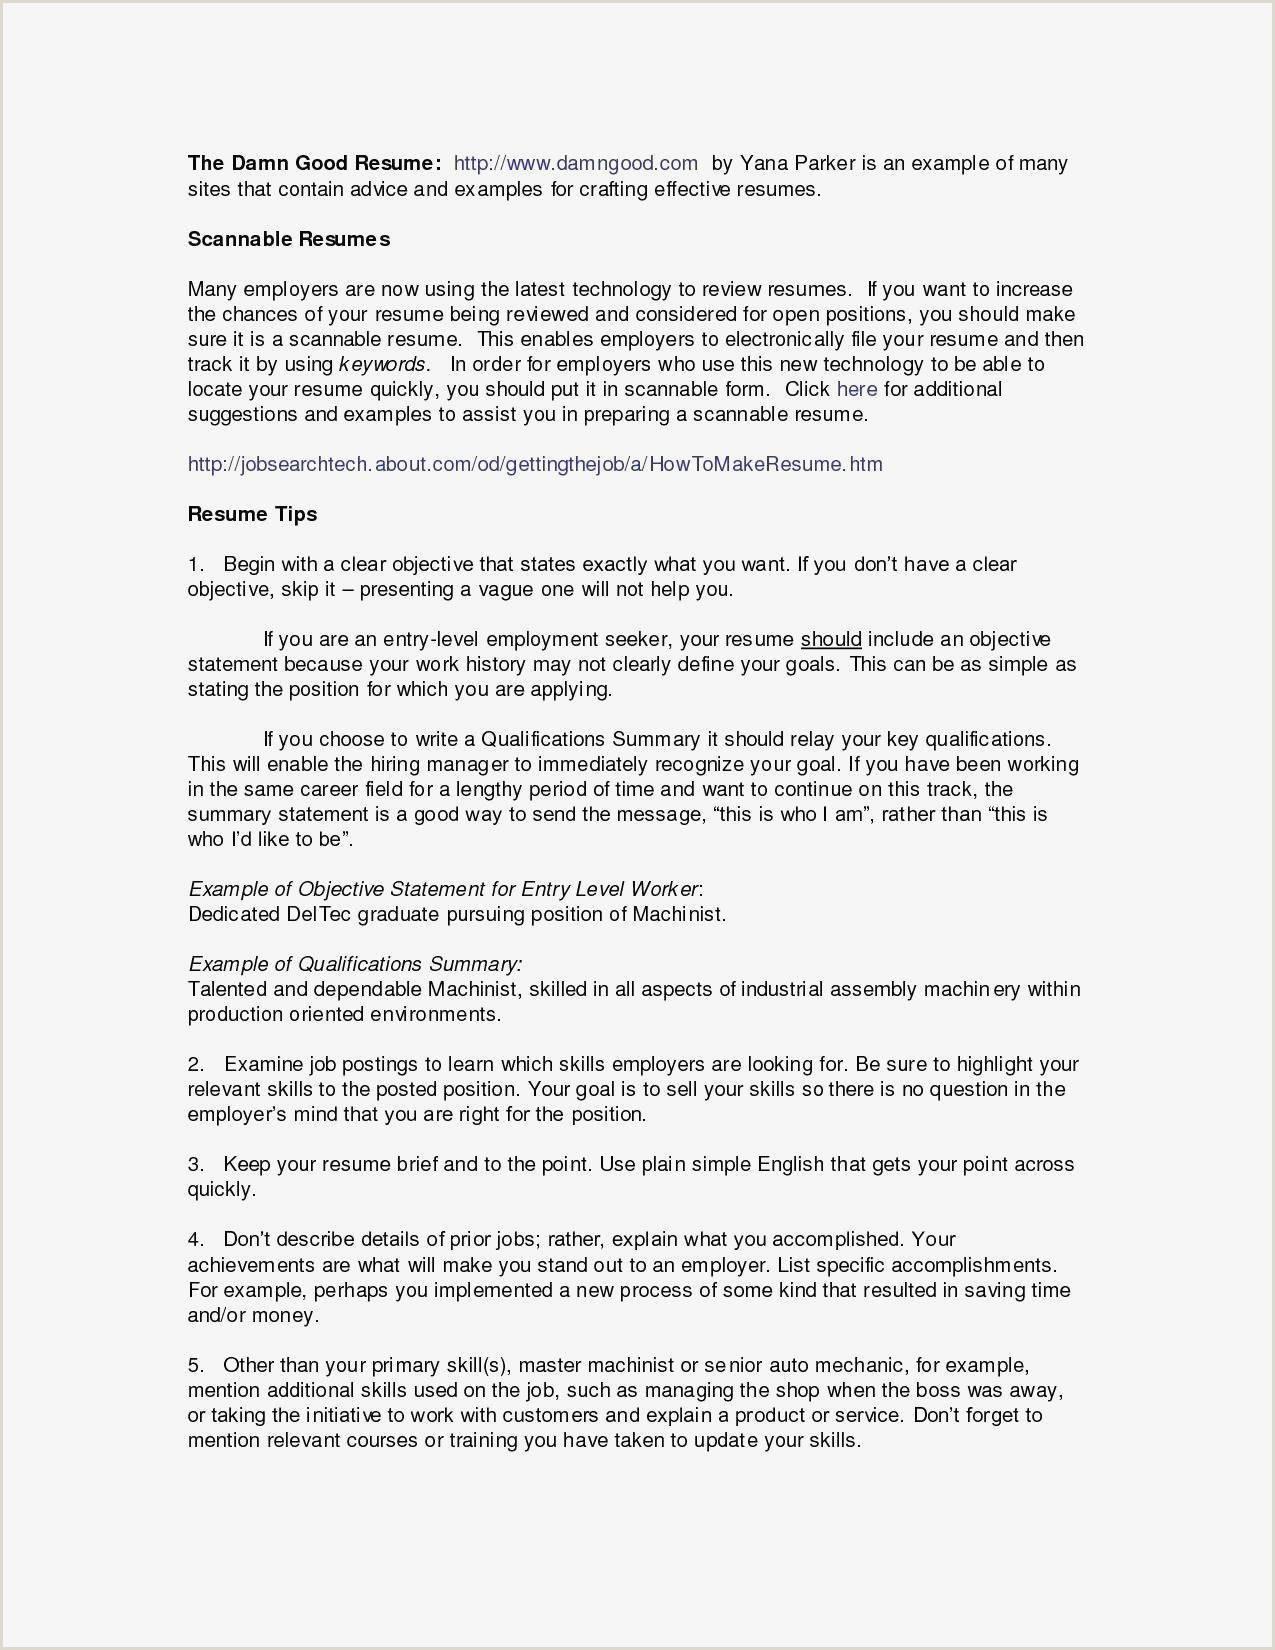 British Standard Cv format Undergraduate Cv Example Janice Brooks – Page 2 – Jscribes